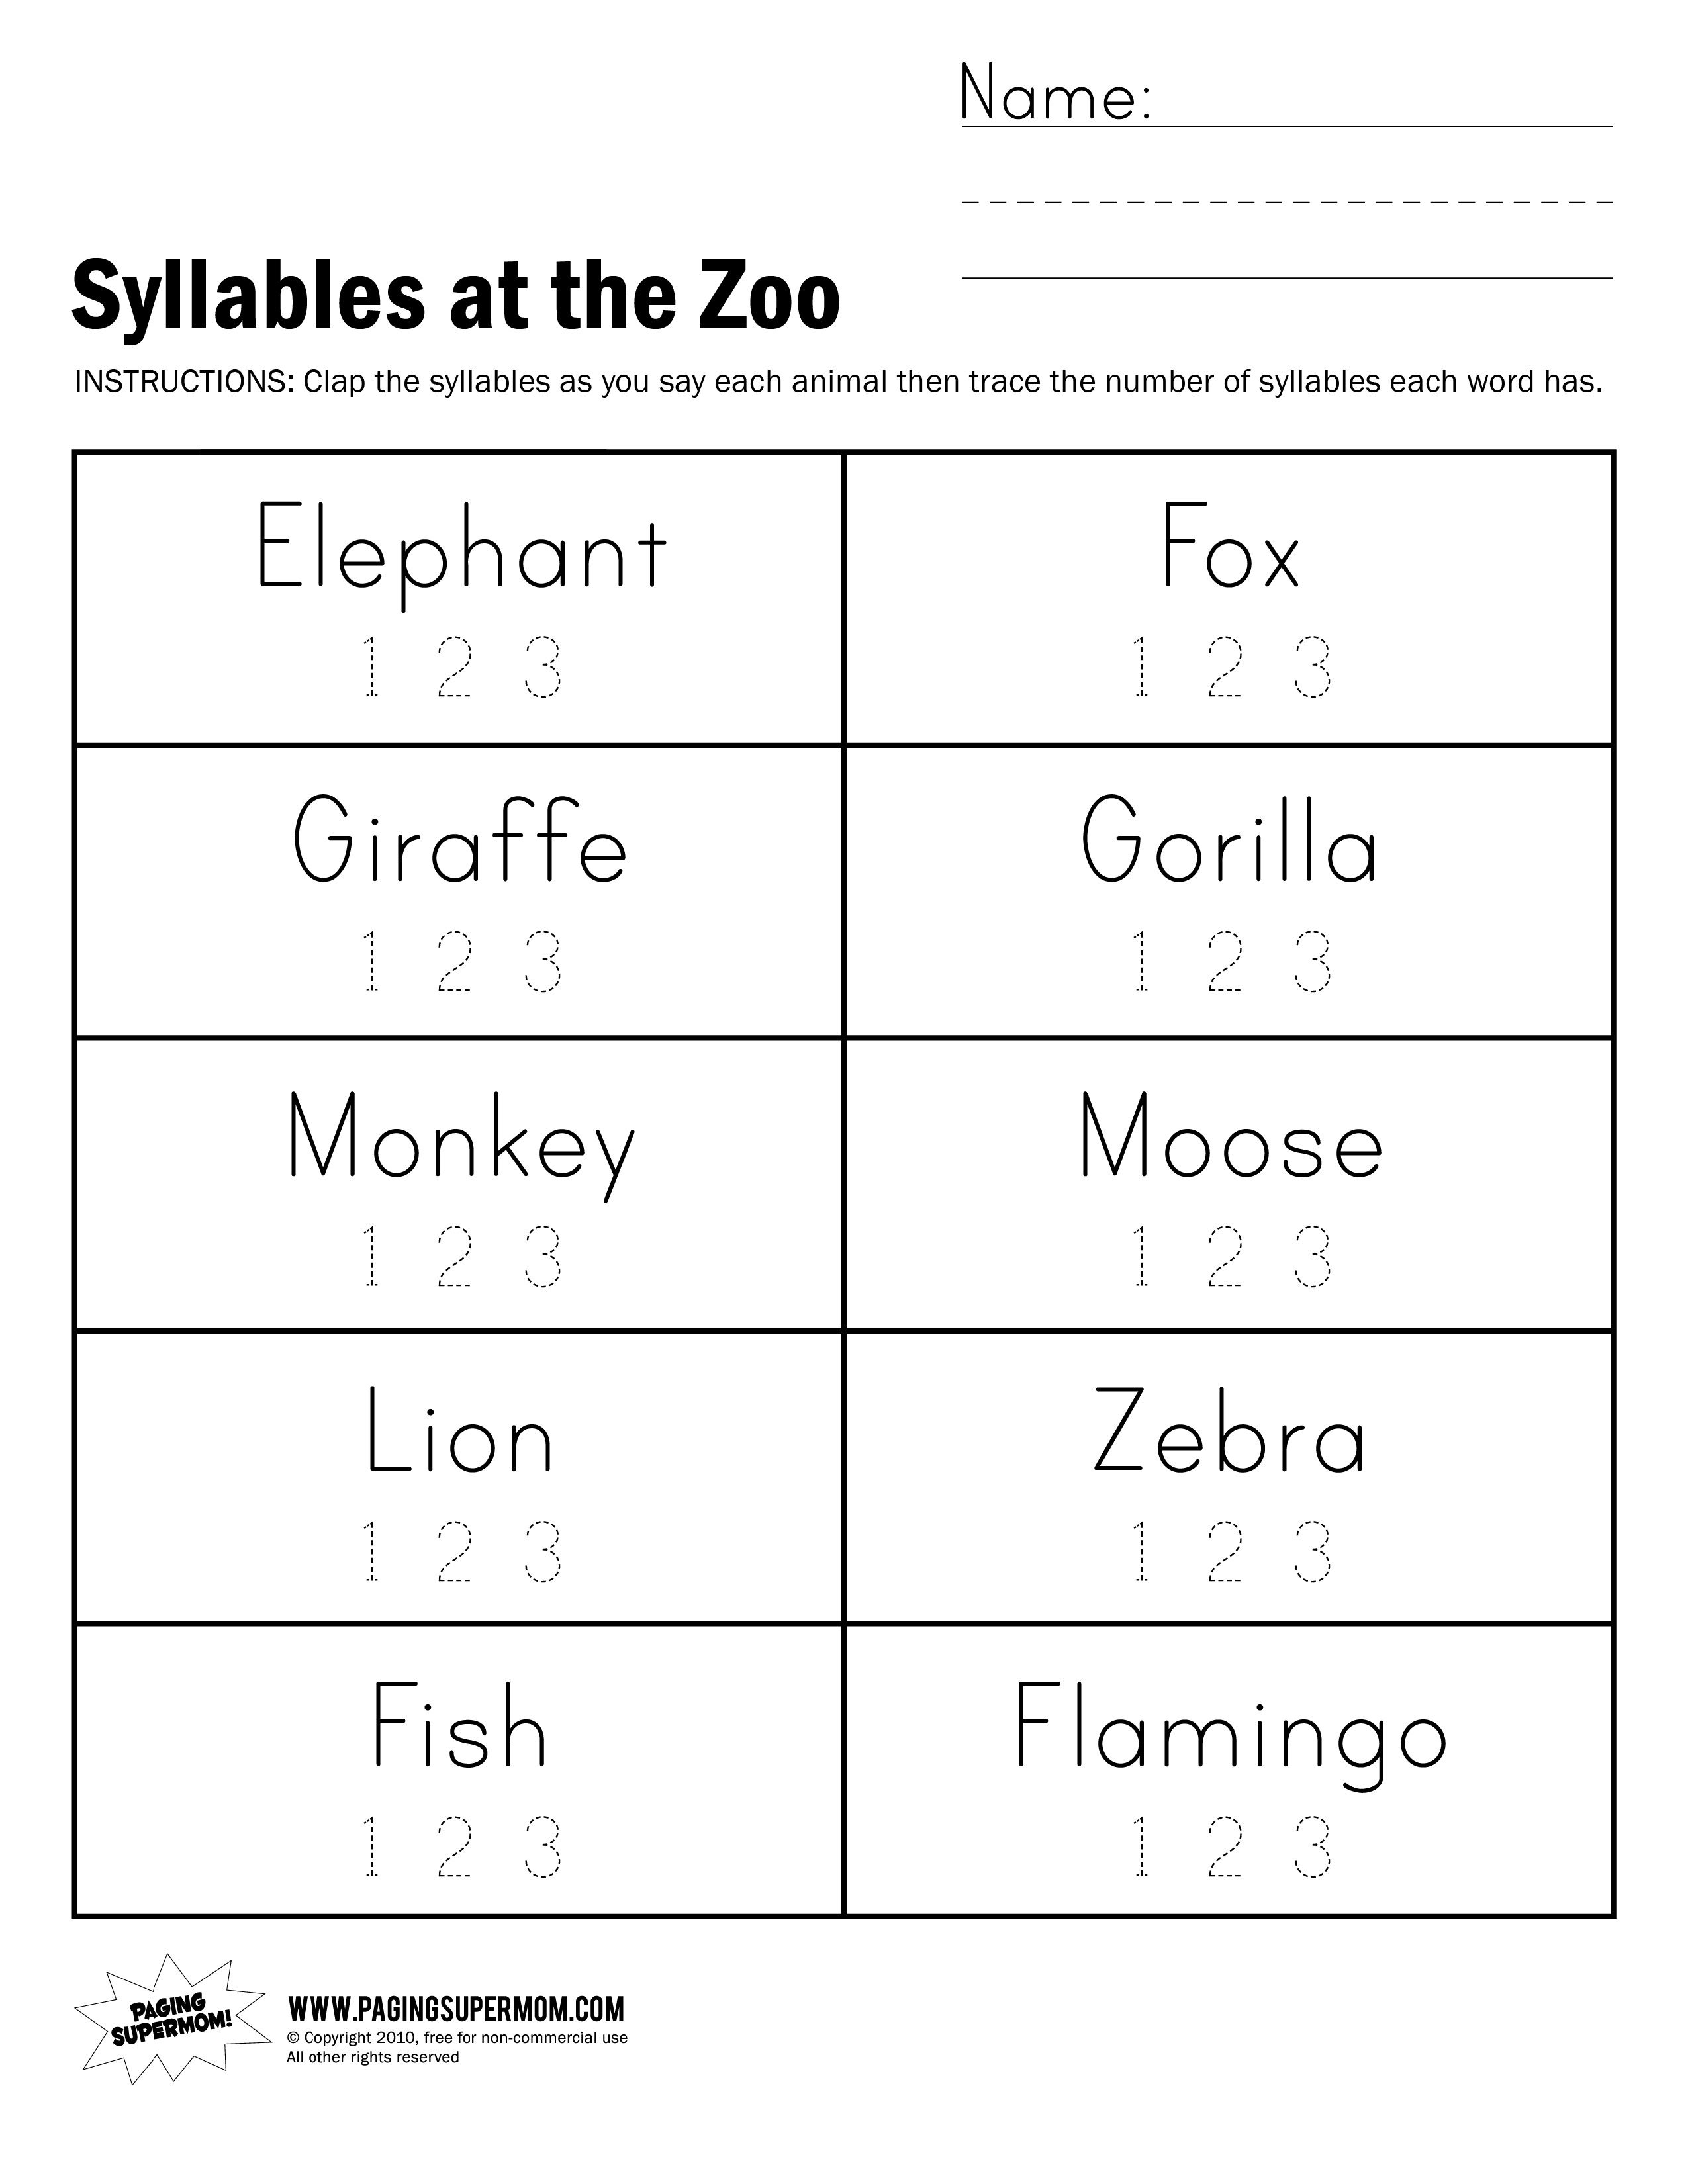 Syllables At The Zoo Worksheet - Free Printable Open And Closed | Free Printable Open And Closed Syllable Worksheets